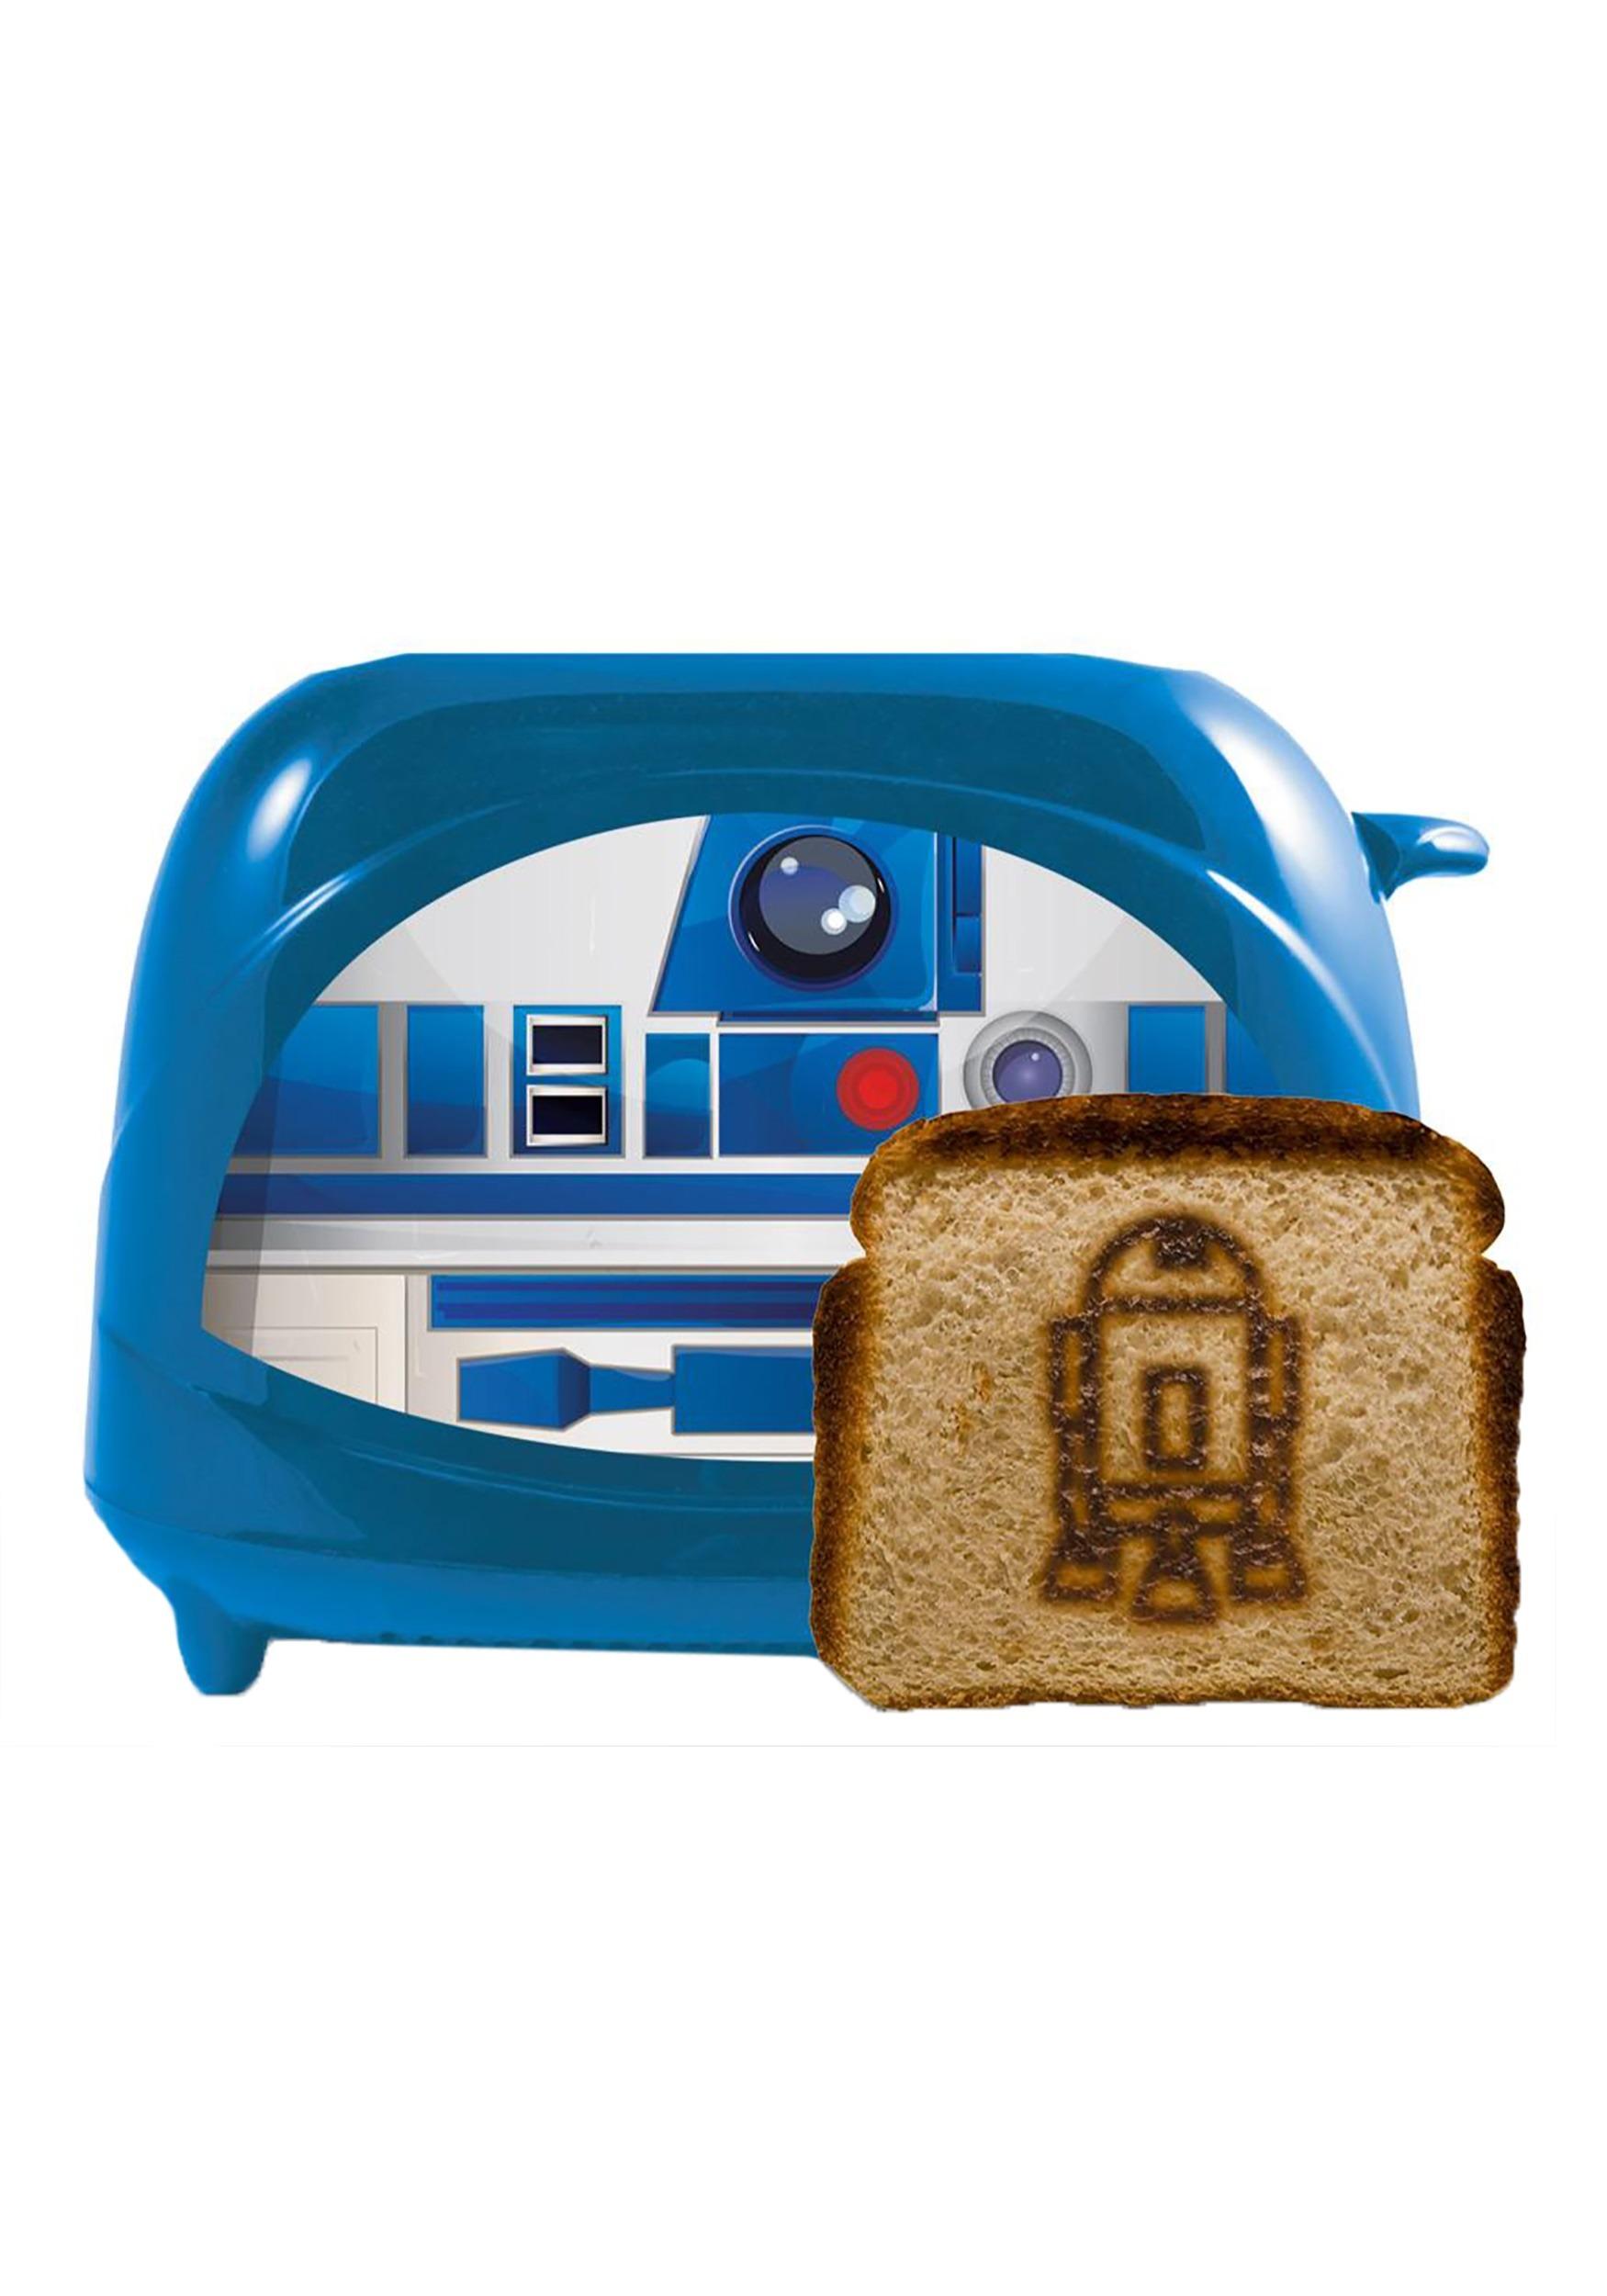 Star Wars R2D2 Empire Toaster Blue